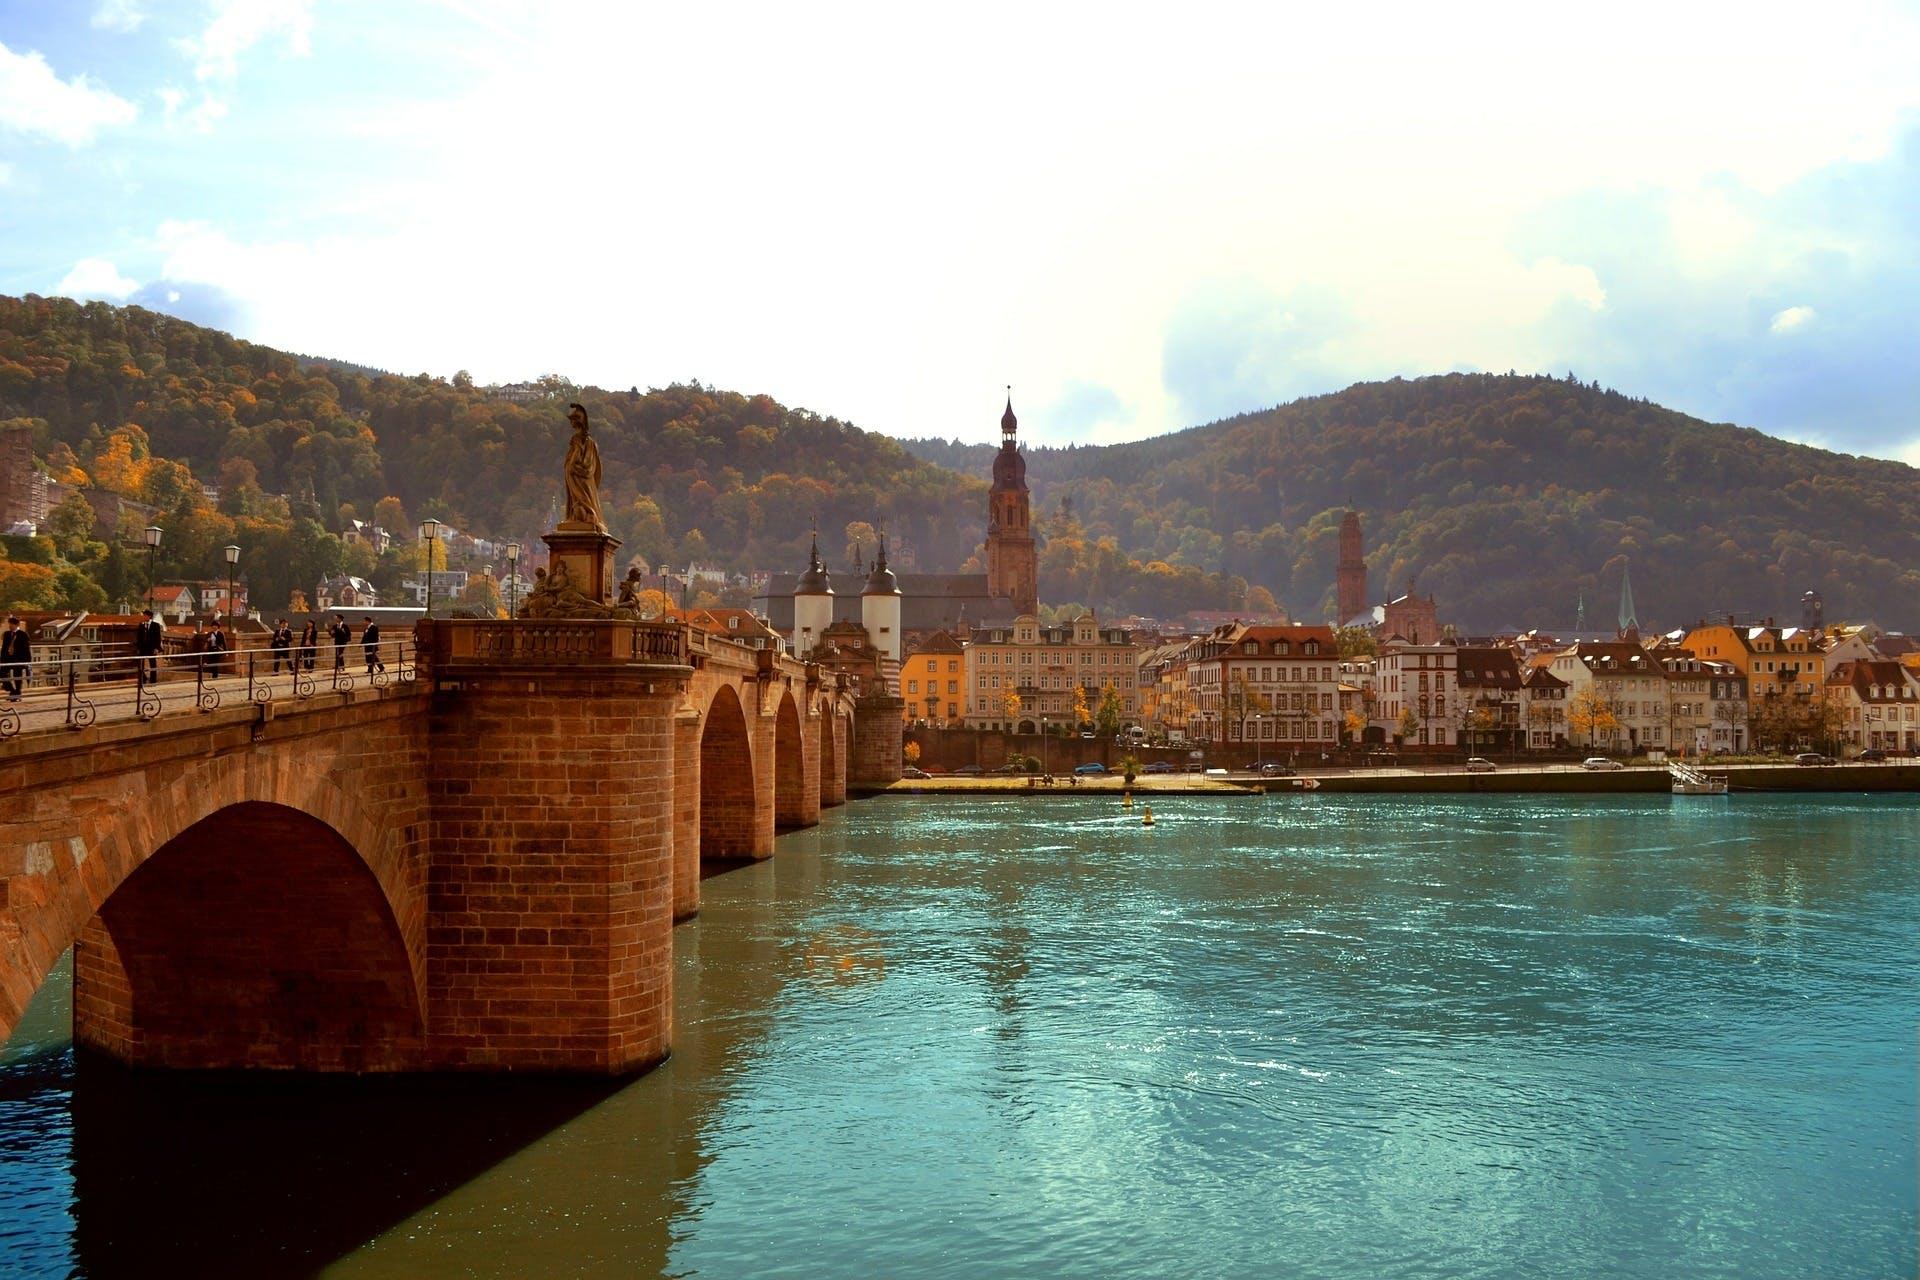 Afternoon tour to Heidelberg from Frankfurt